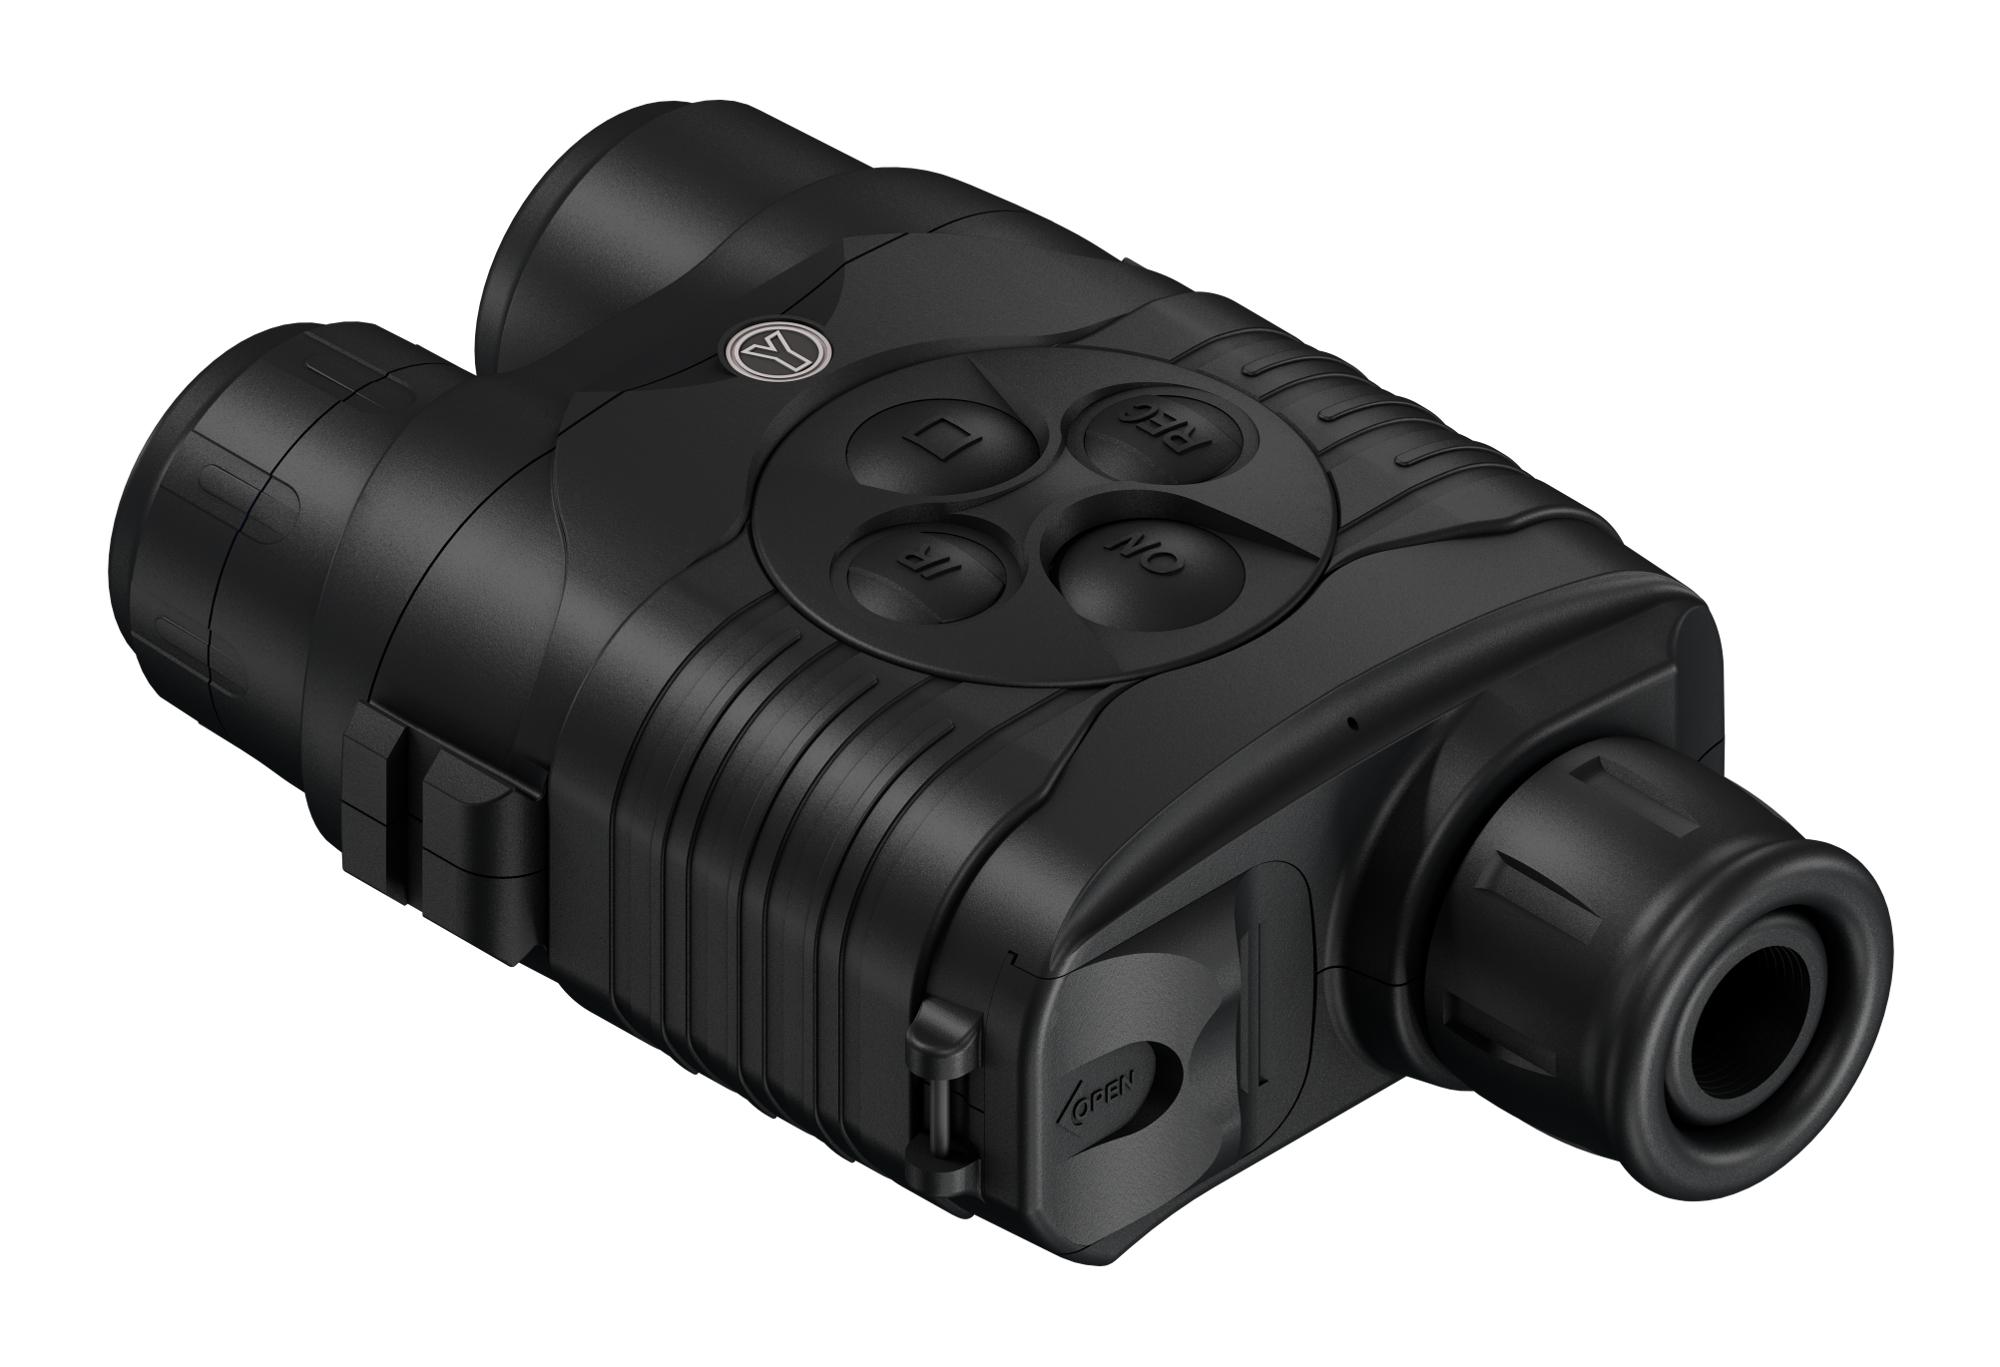 Yukon signal n340 rt 4.5x28 digitales nachtsichtgerät mono bresser